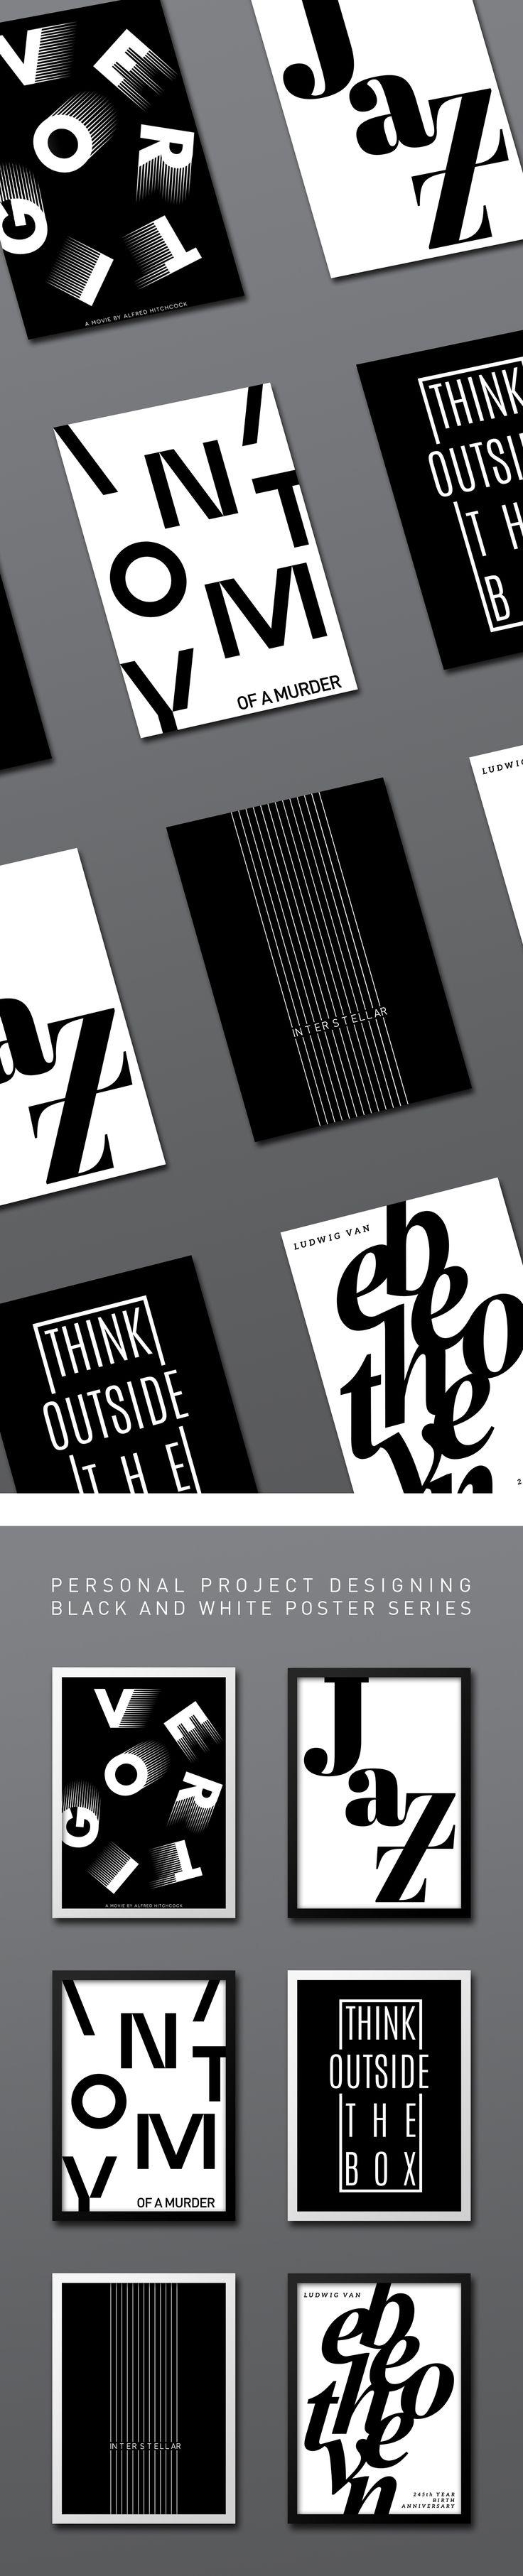 Confira este projeto do @Behance: u201cB&W Poster Seriesu201d https://www.behance.net/gallery/56940945/B-W-Poster-Series